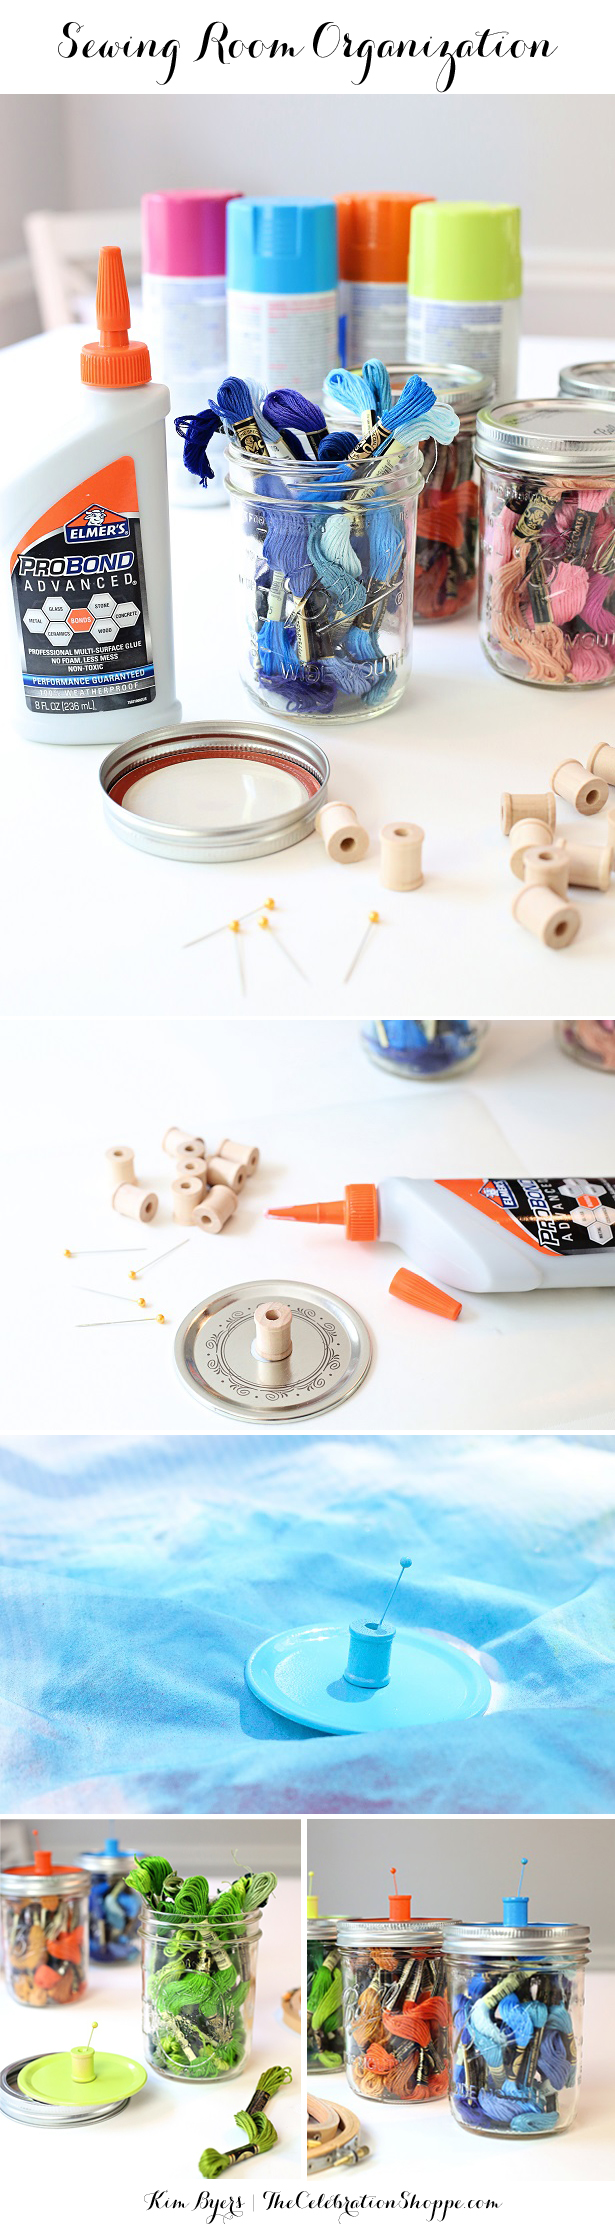 Sewing Organization Ideas | Kim Byers